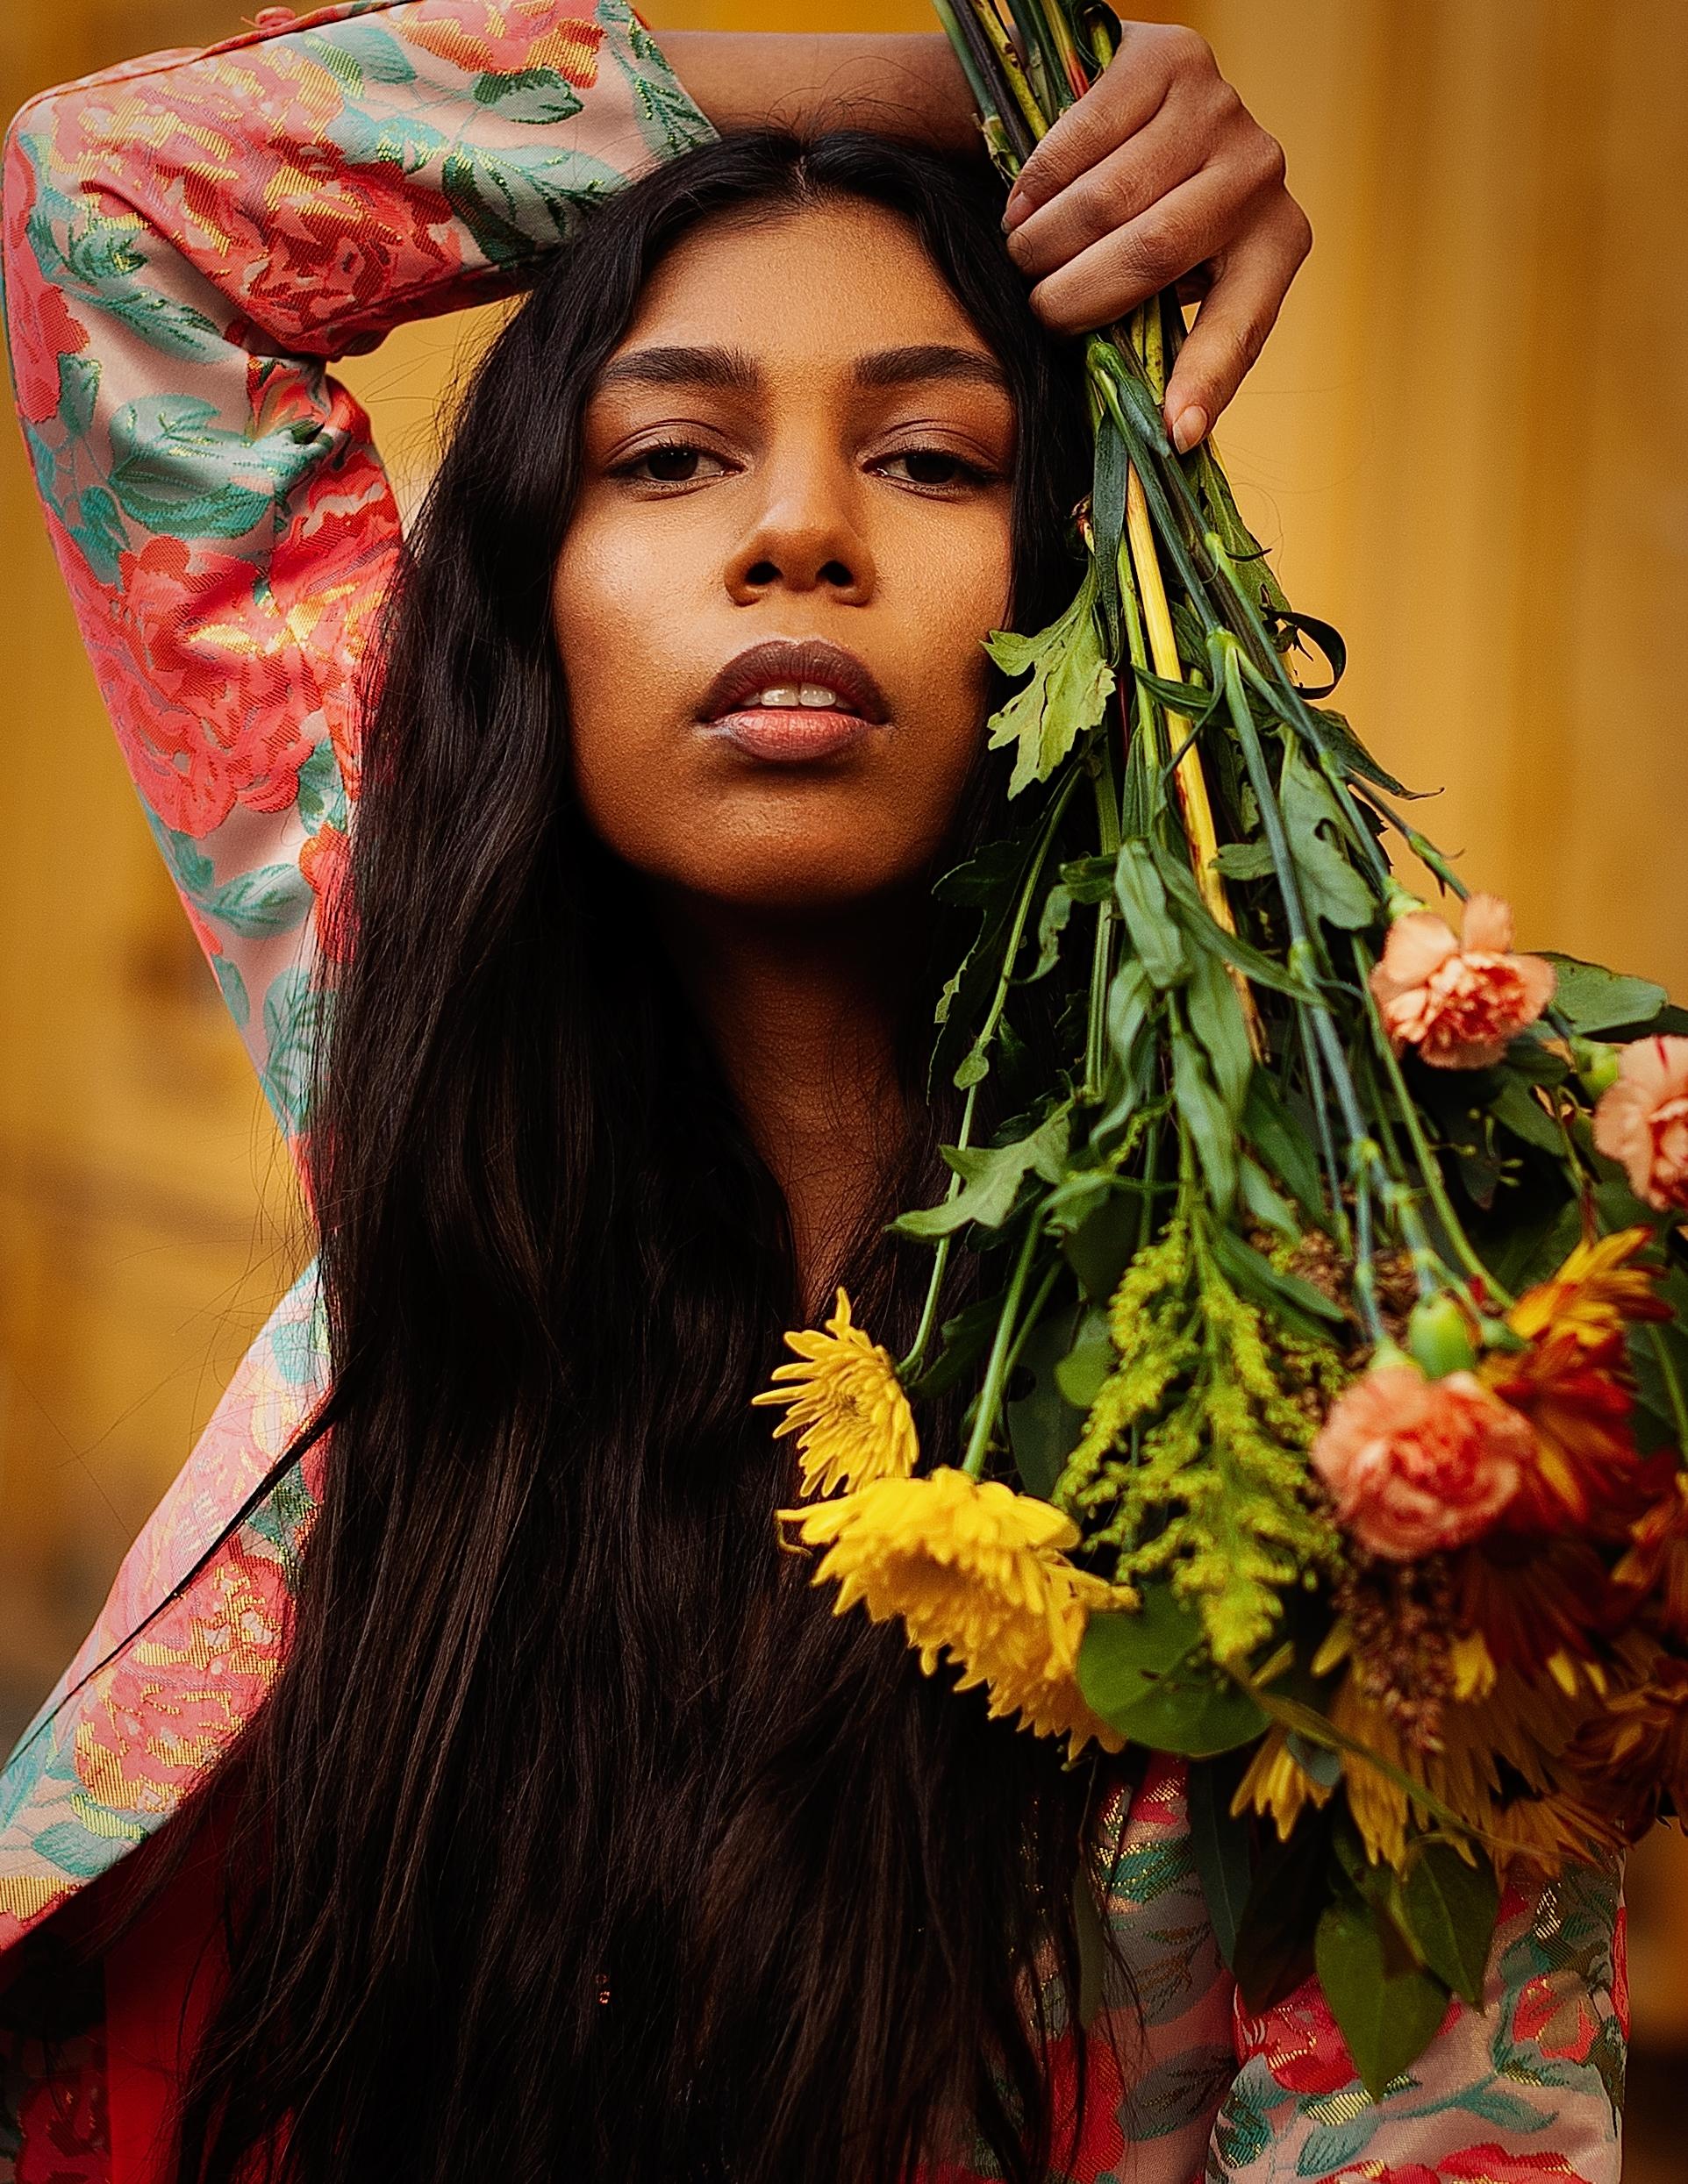 Model: @itsajali  MUA: @christophermilesmakeup  Photo: @chrisblackwellphoto